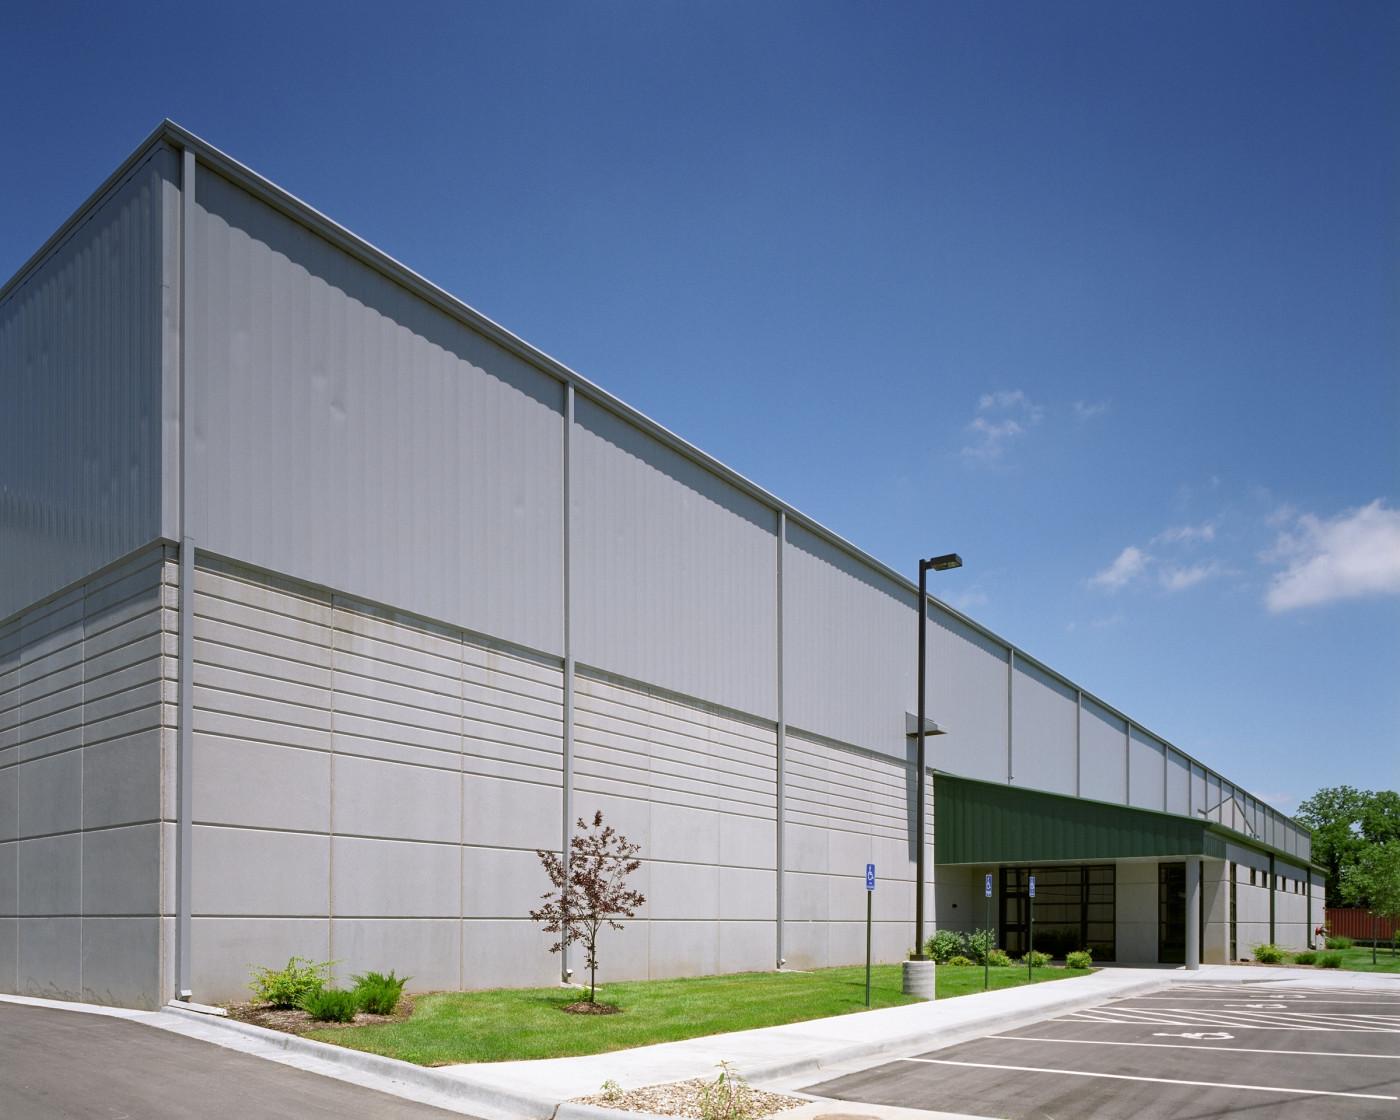 Long Motor Corporation Warehouse